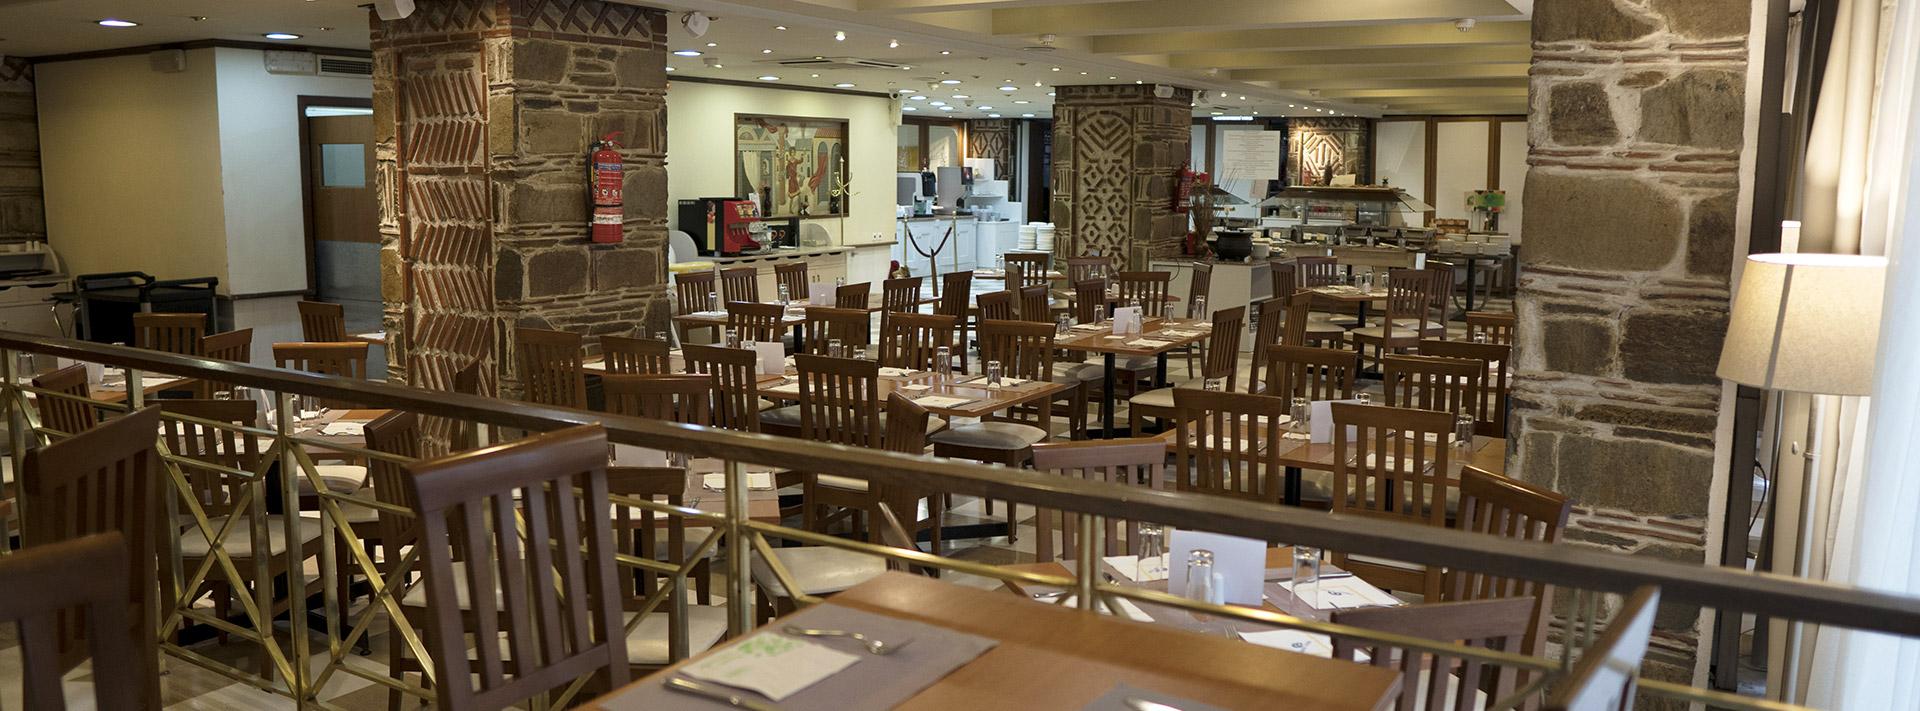 capsis hotel thessaloniki byzantium restaurant